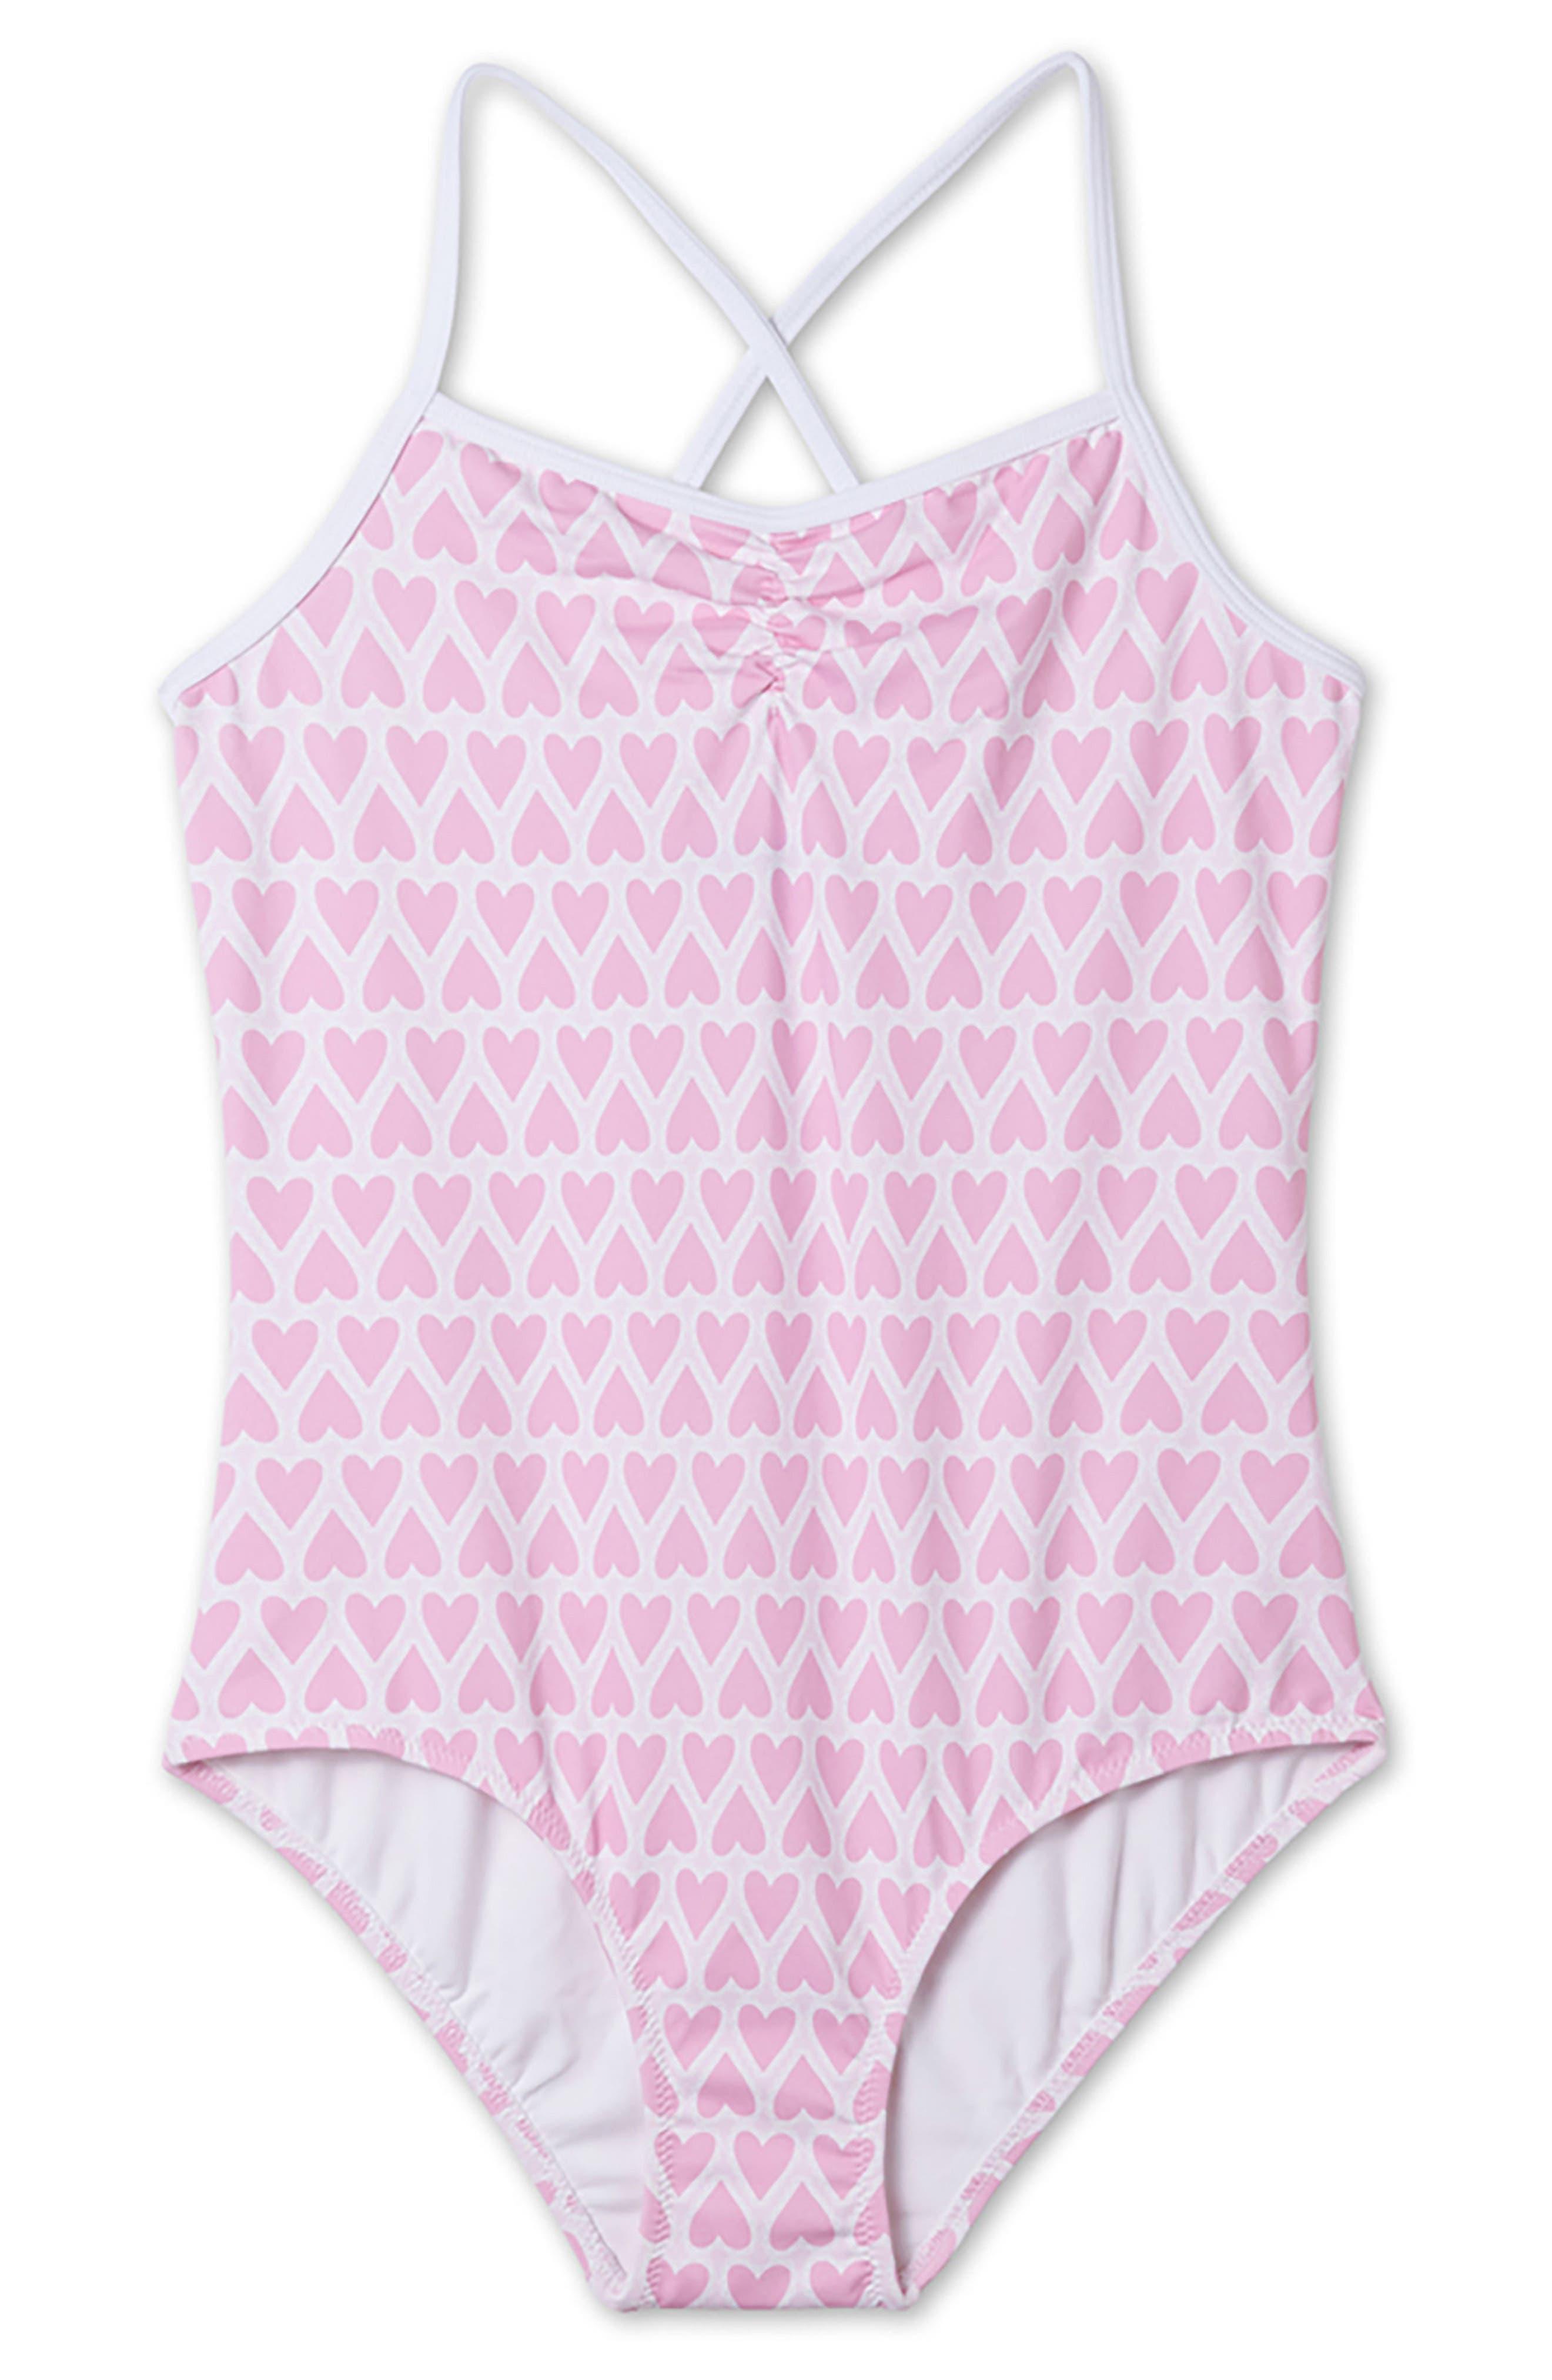 Heart Print One-Piece Swimsuit,                             Main thumbnail 1, color,                             650